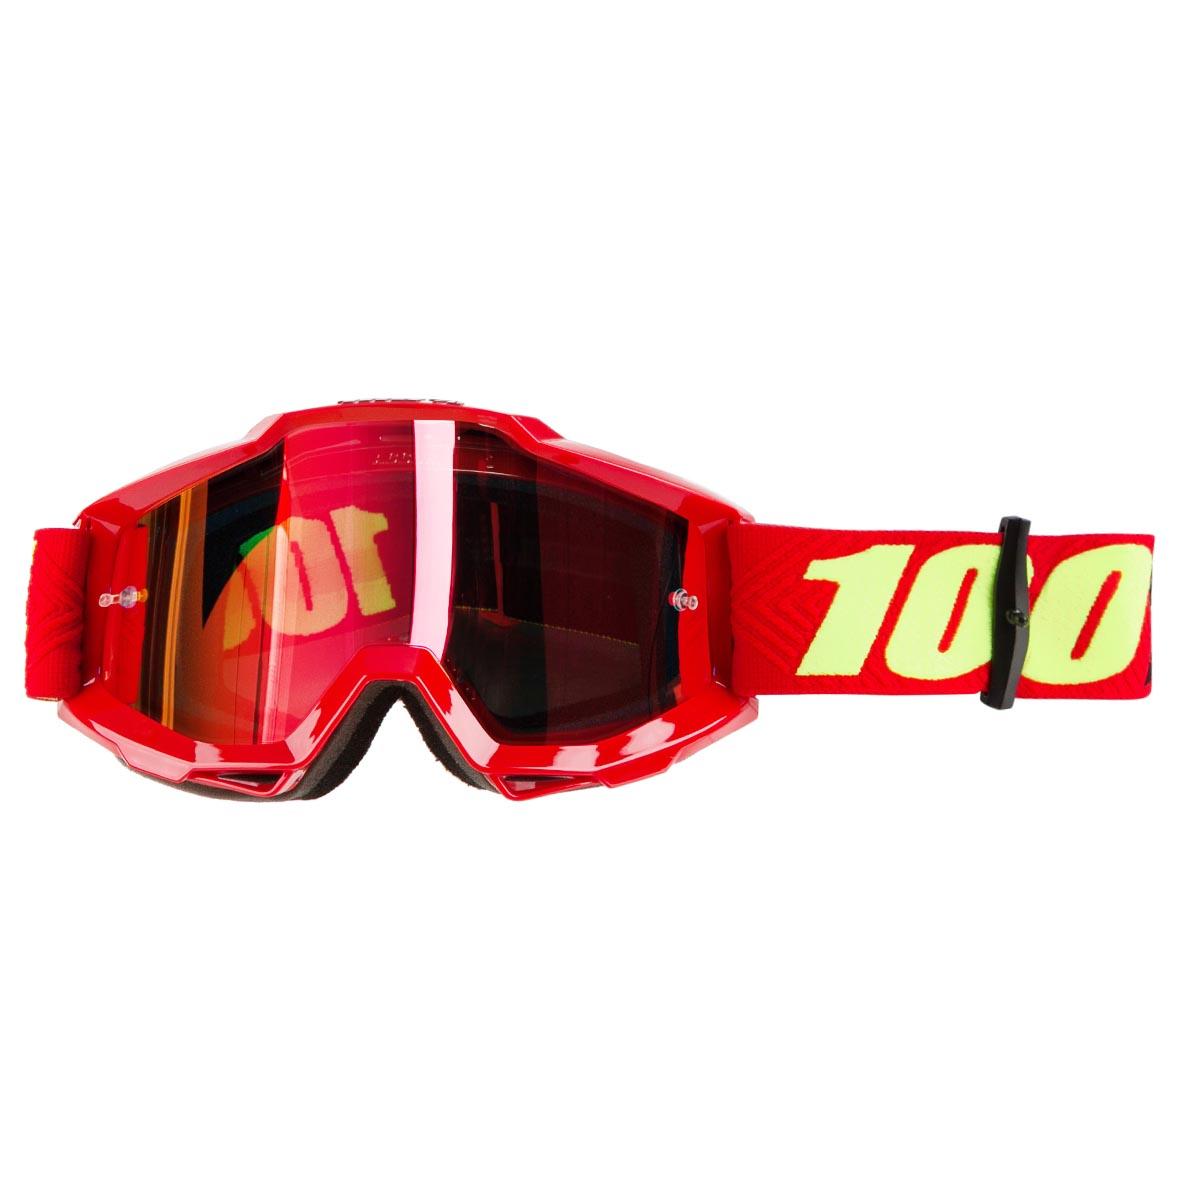 100% Crossbrille The Accuri Saarinen - Rot verspiegelt Anti-Fog